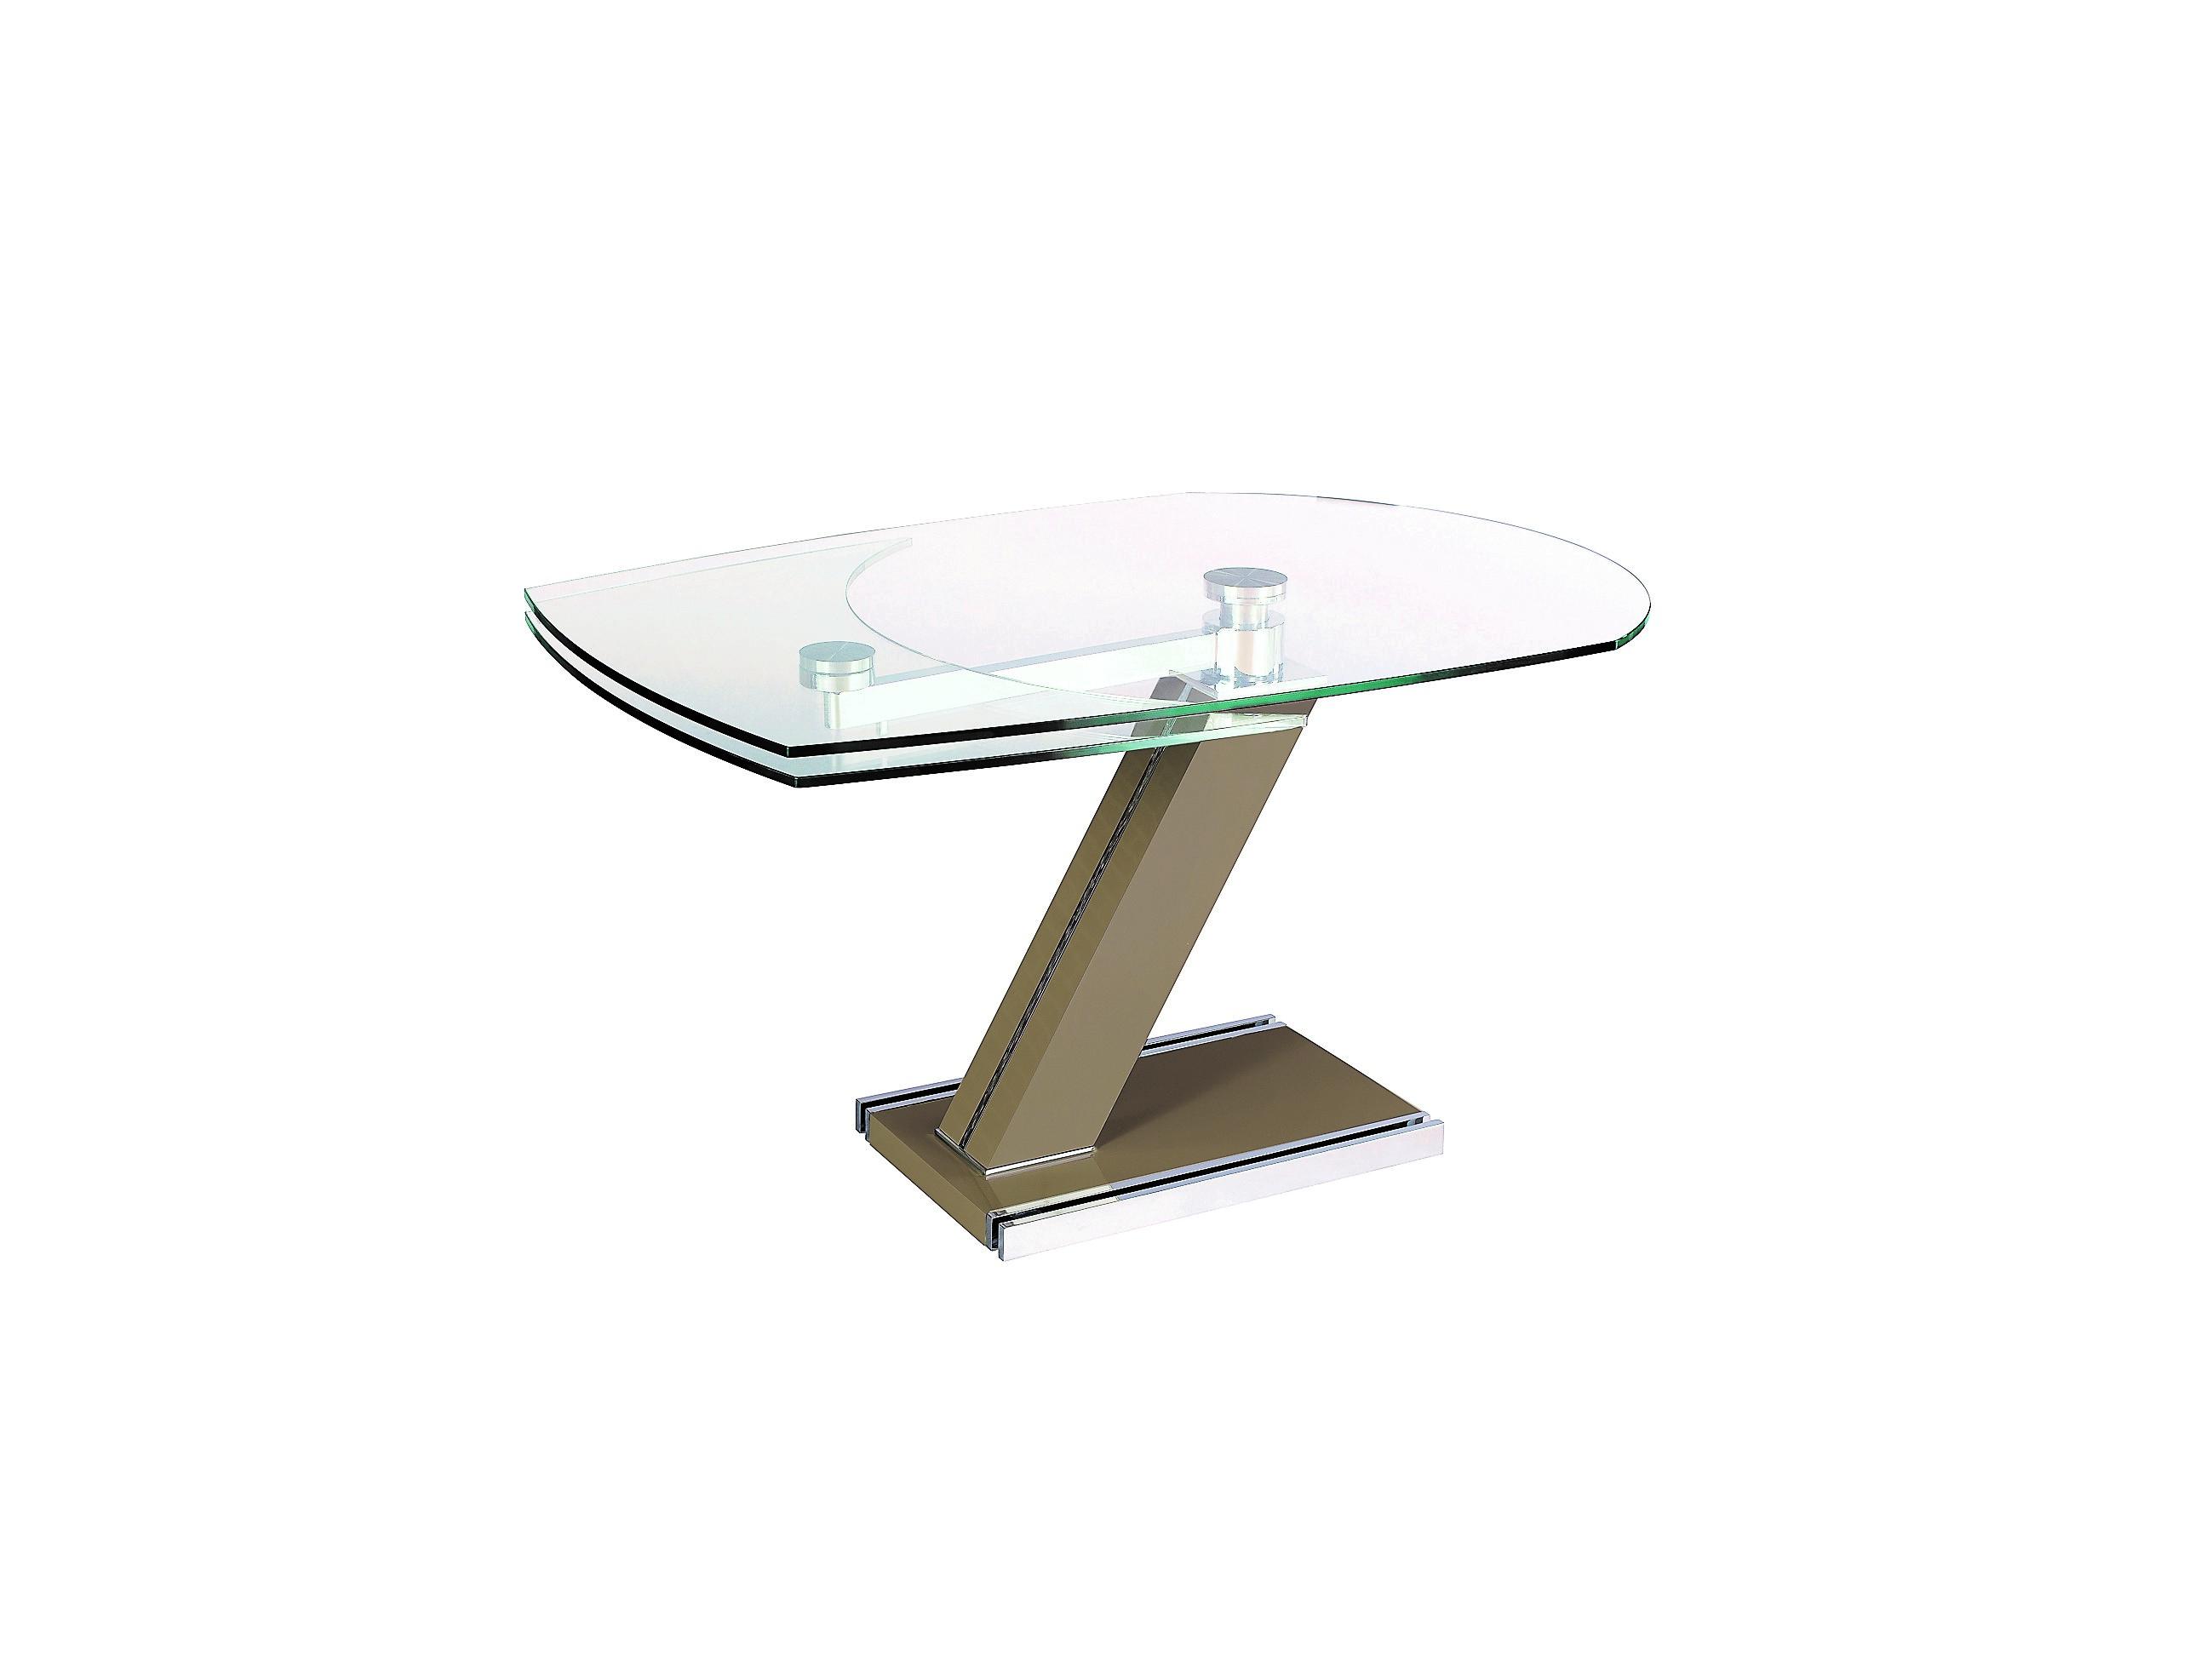 zebra shadow eda concept collection de meubles design. Black Bedroom Furniture Sets. Home Design Ideas